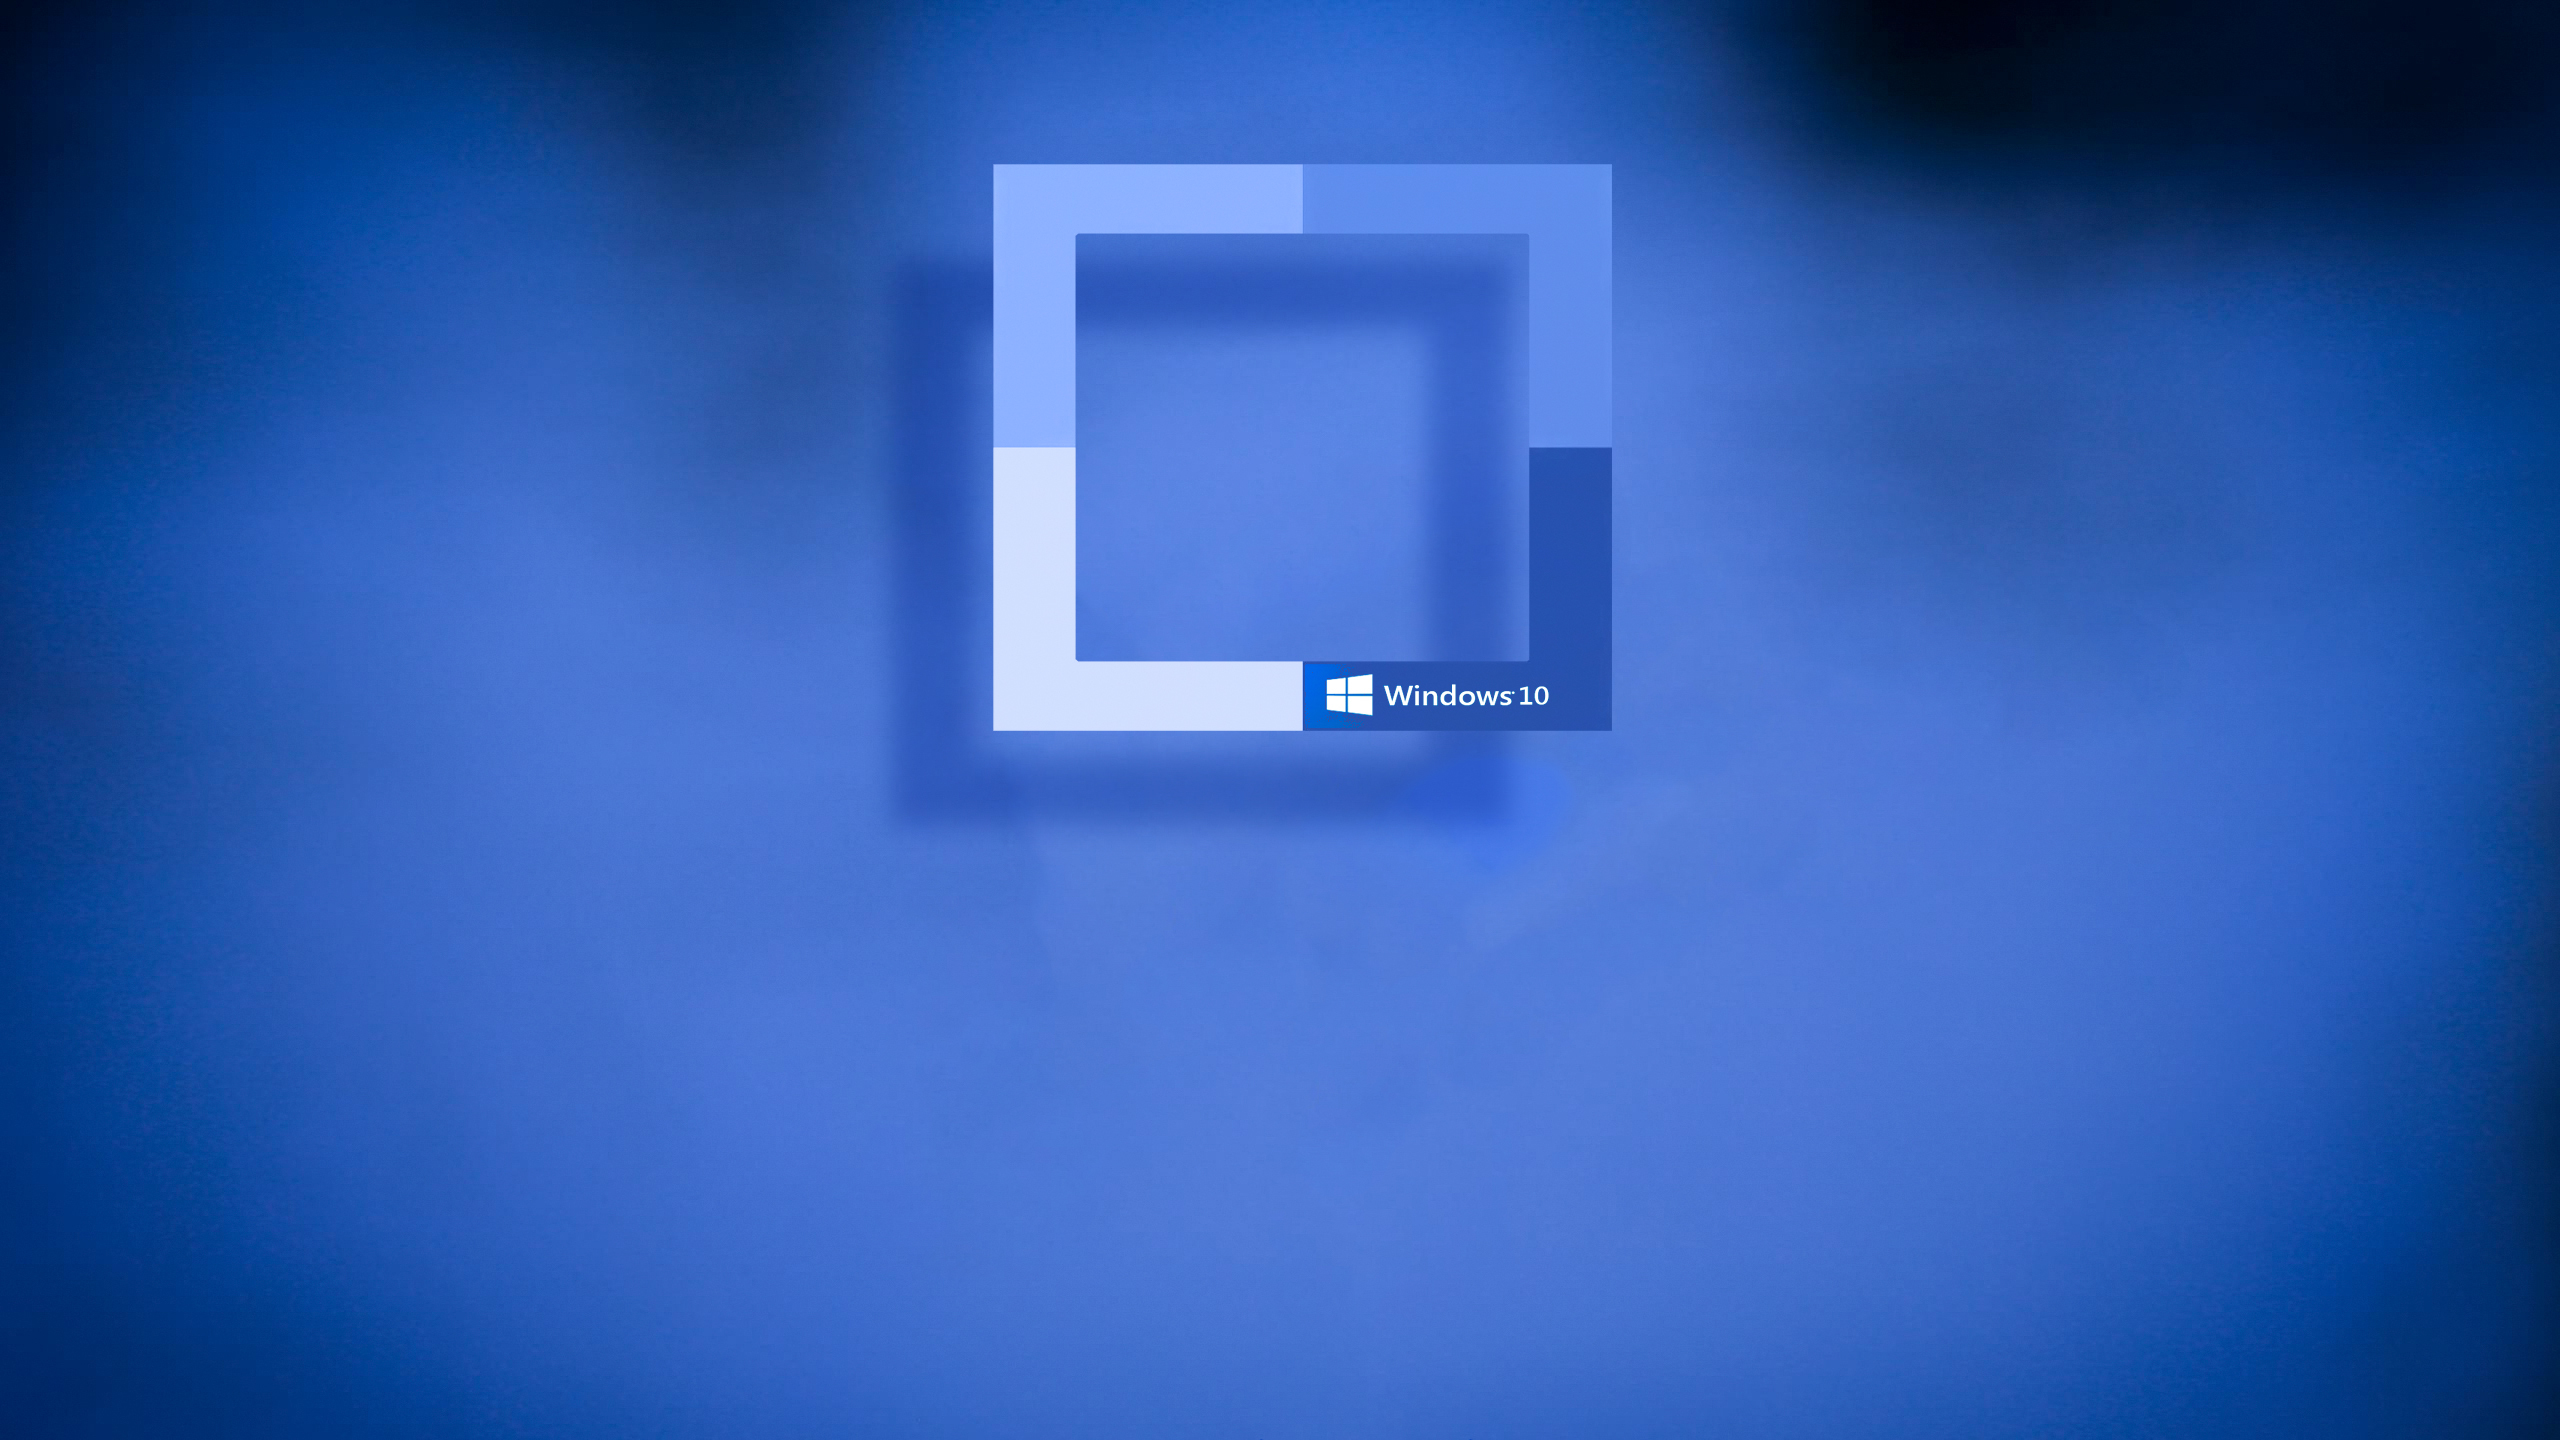 Windows 10 Wallpapers Desktop Backgrounds   5   HD Wallpapers 2560x1440